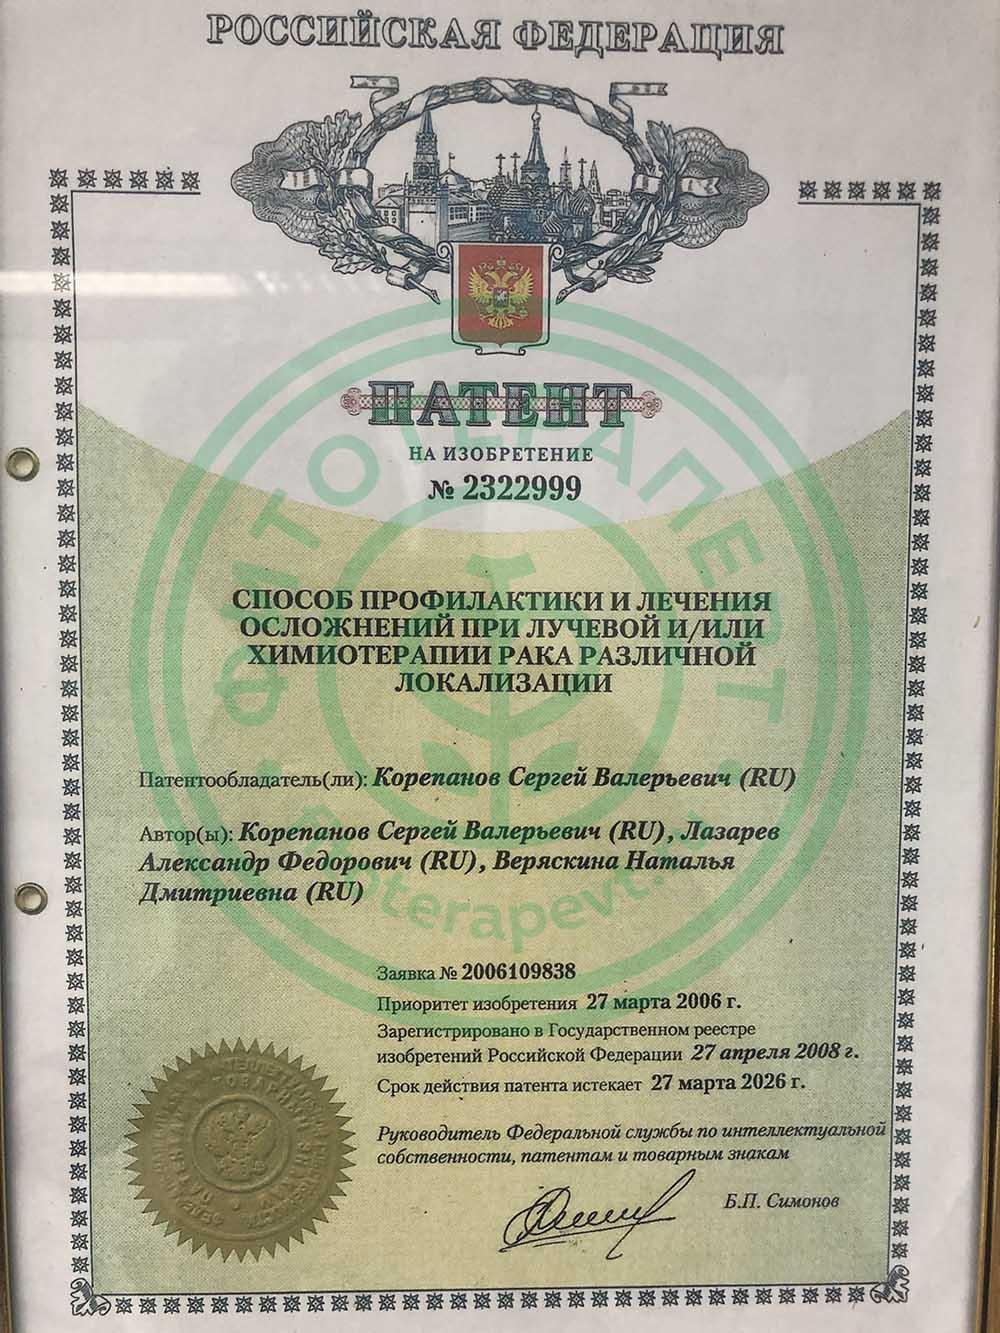 Патент Алфита на фитотерапию при лучевом и химио лечение